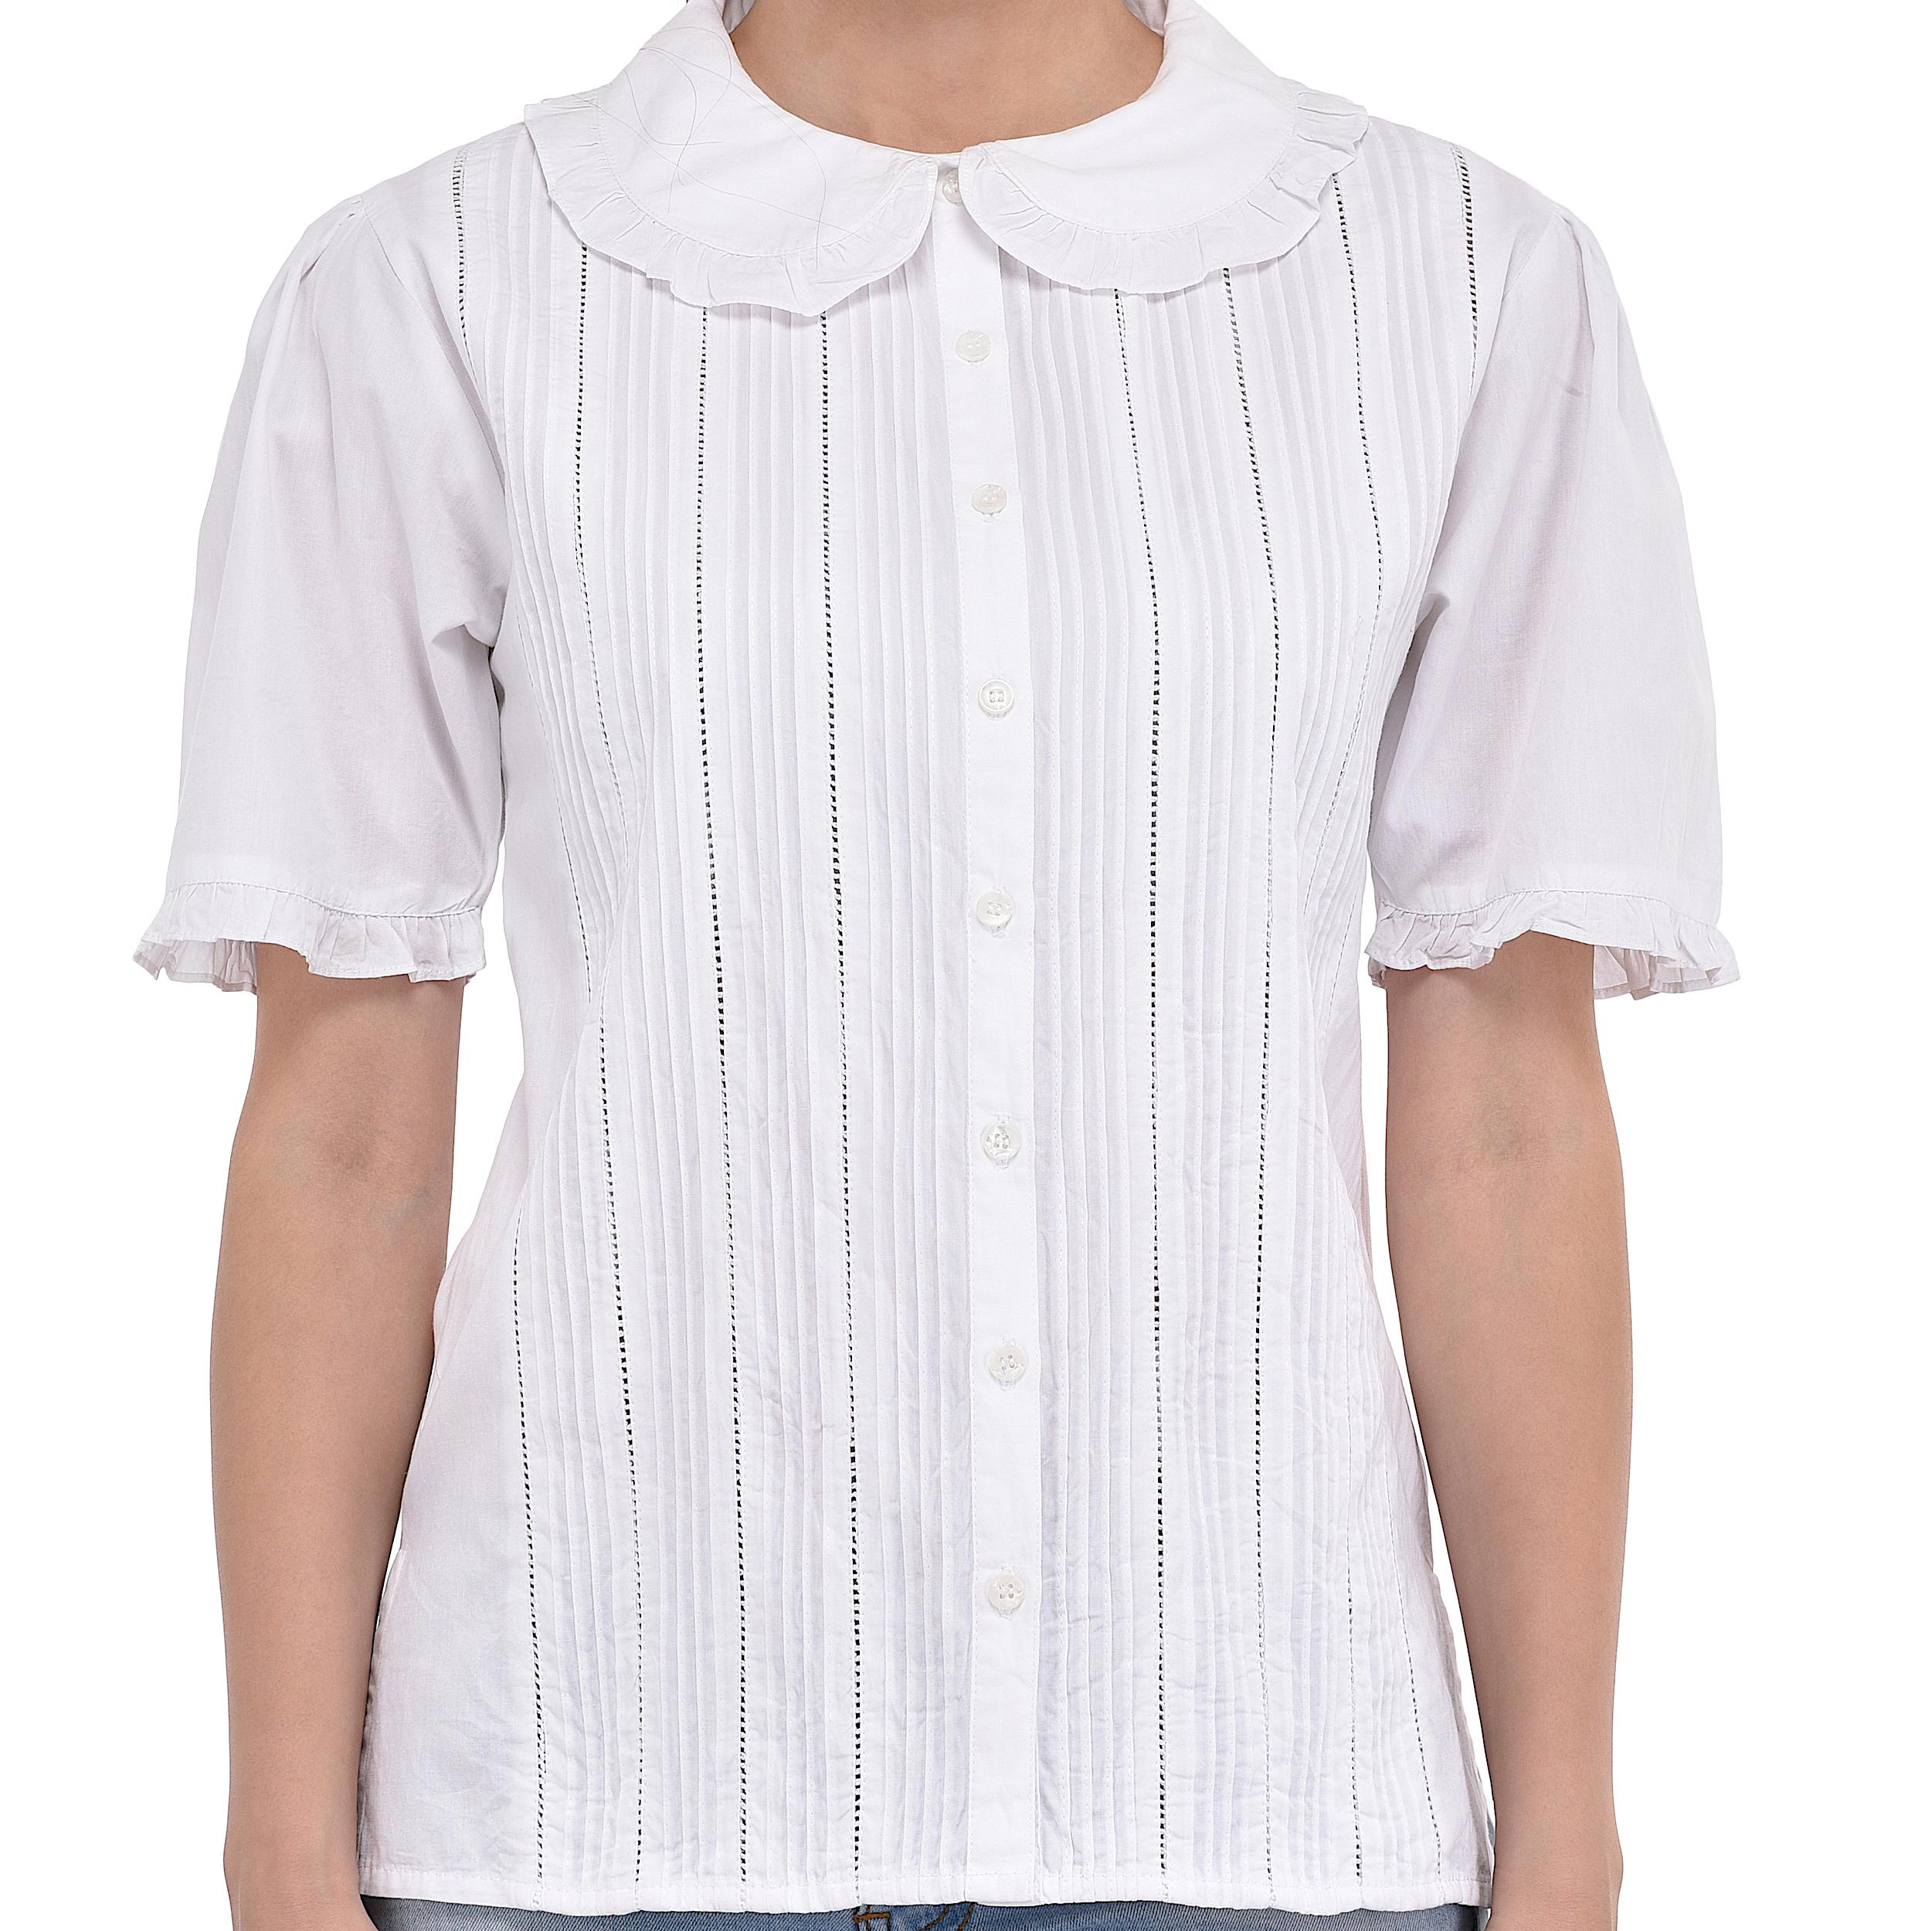 52f4f89ae Short Sleeve Peter Pan Collar Shirt – EDGE Engineering and ...